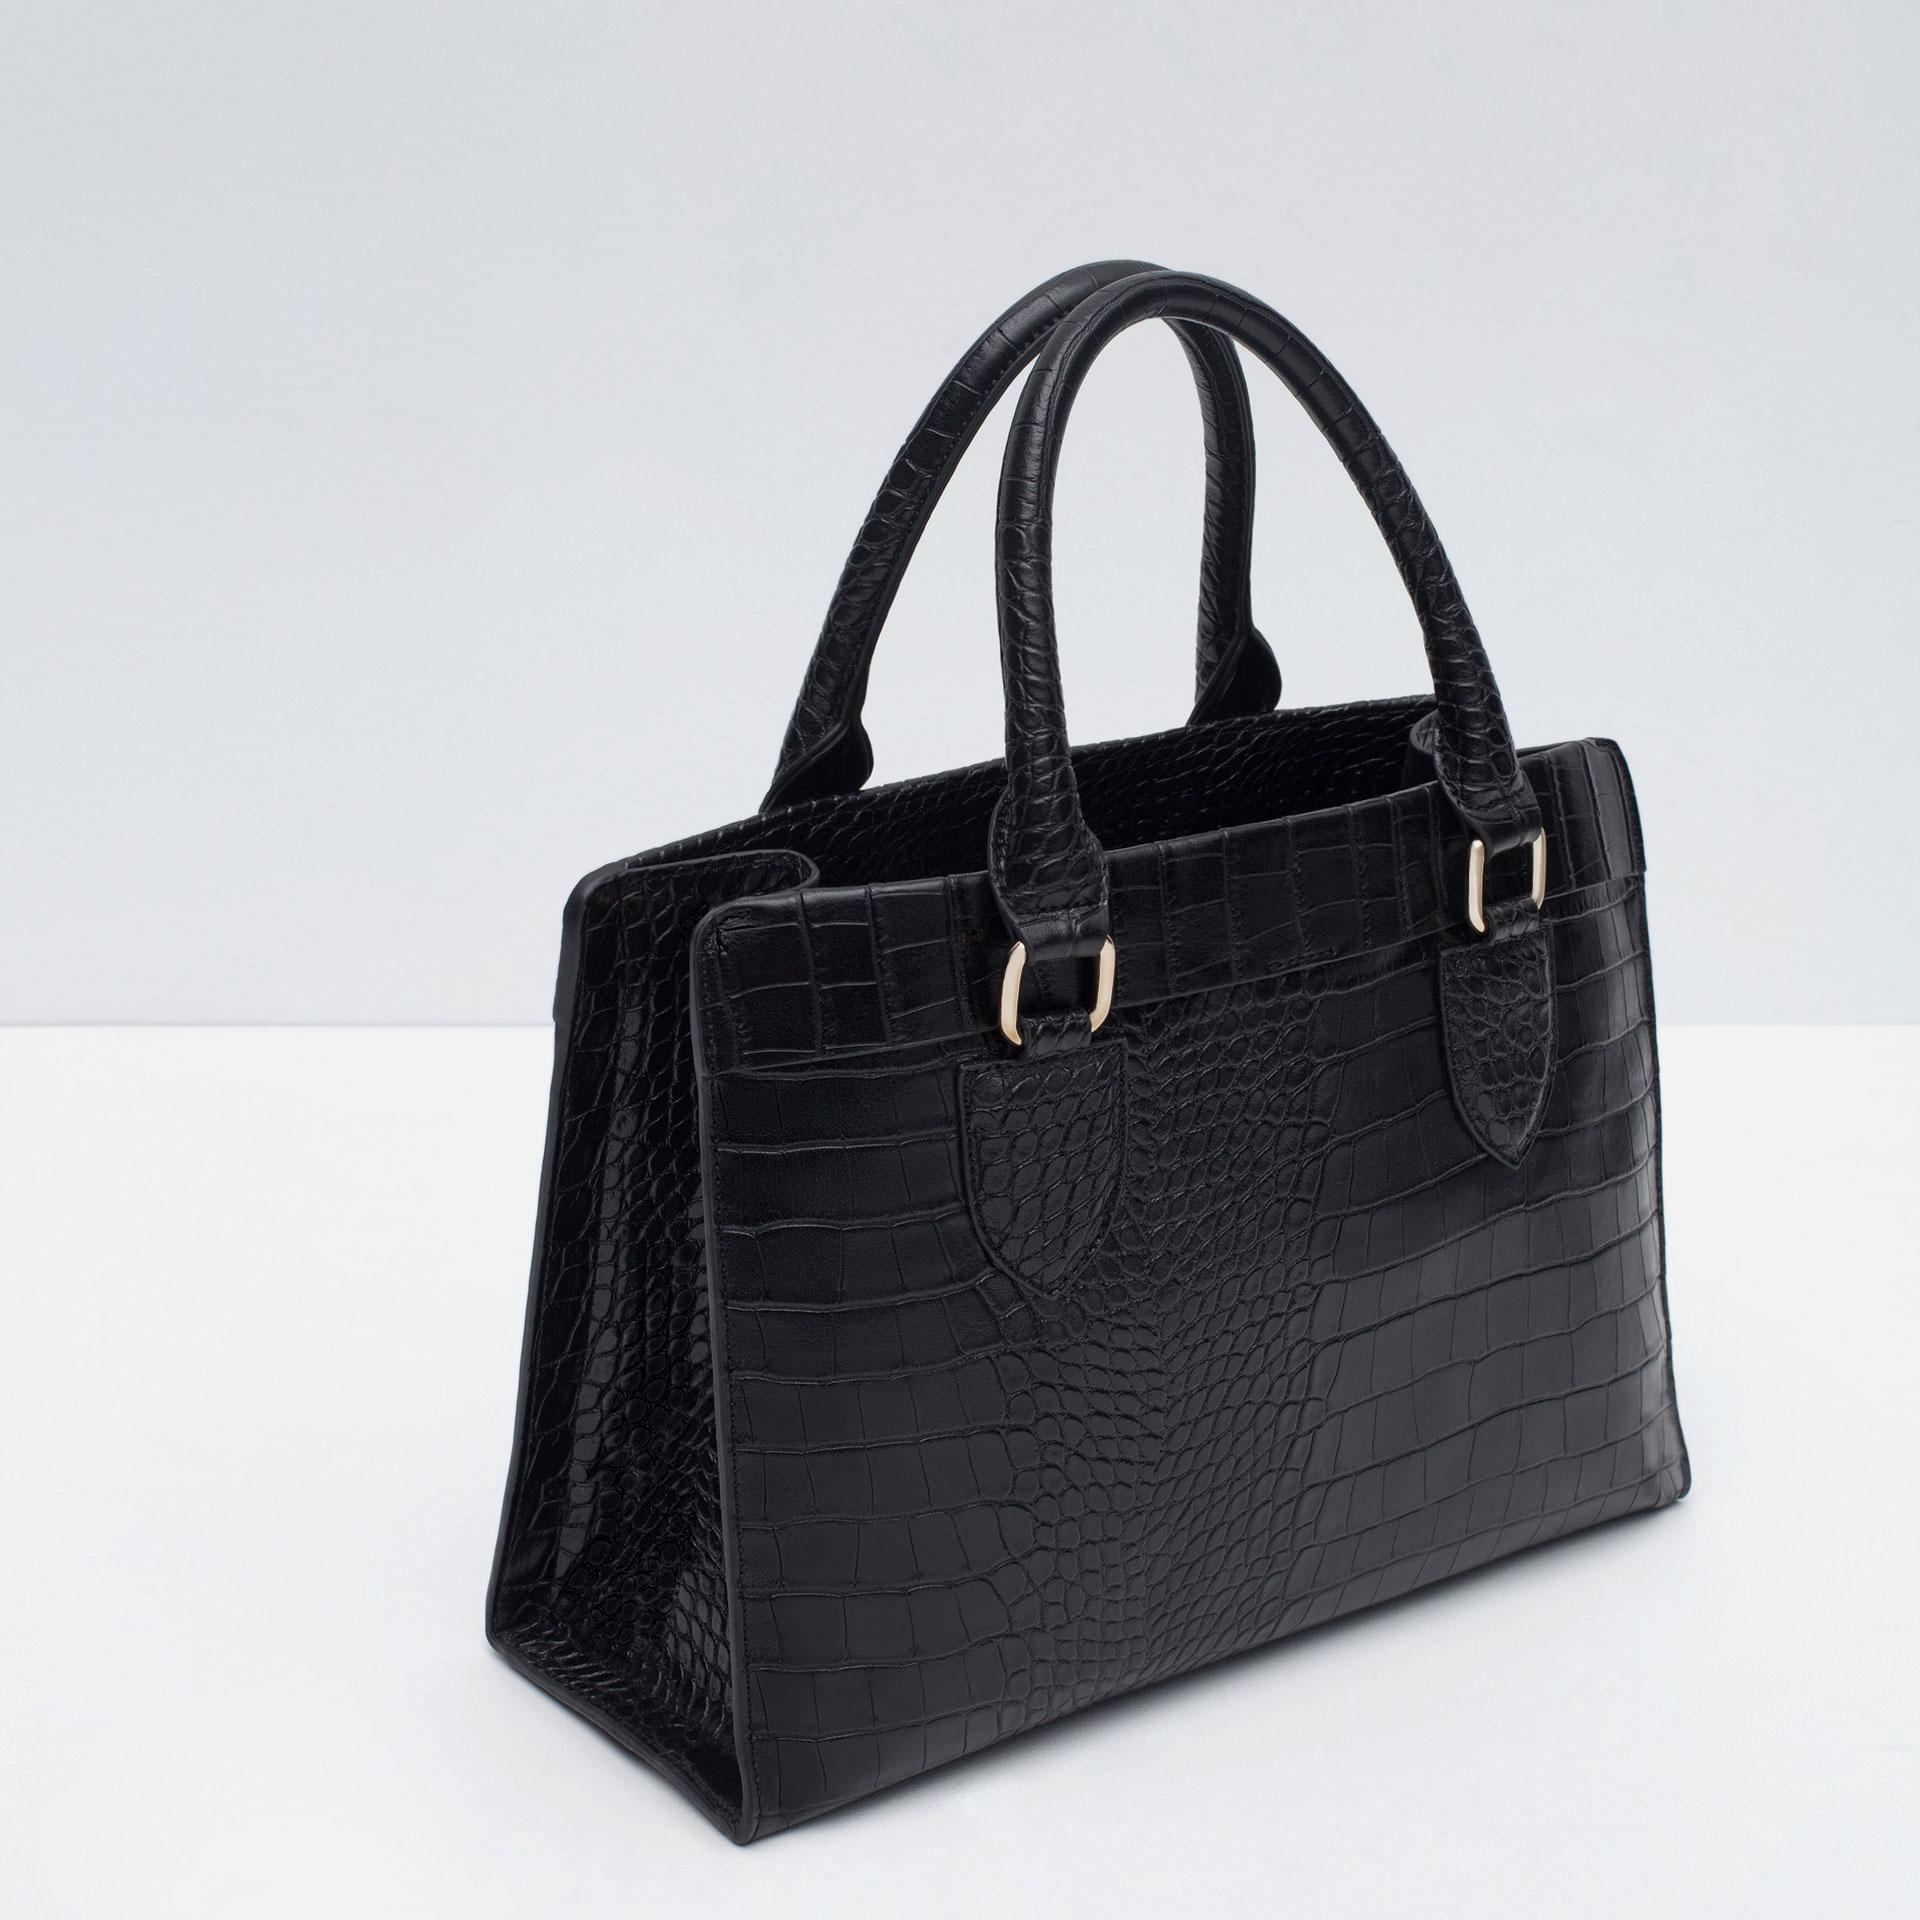 celine handbag cost - Zara Mock Croc City Bag in Black | Lyst